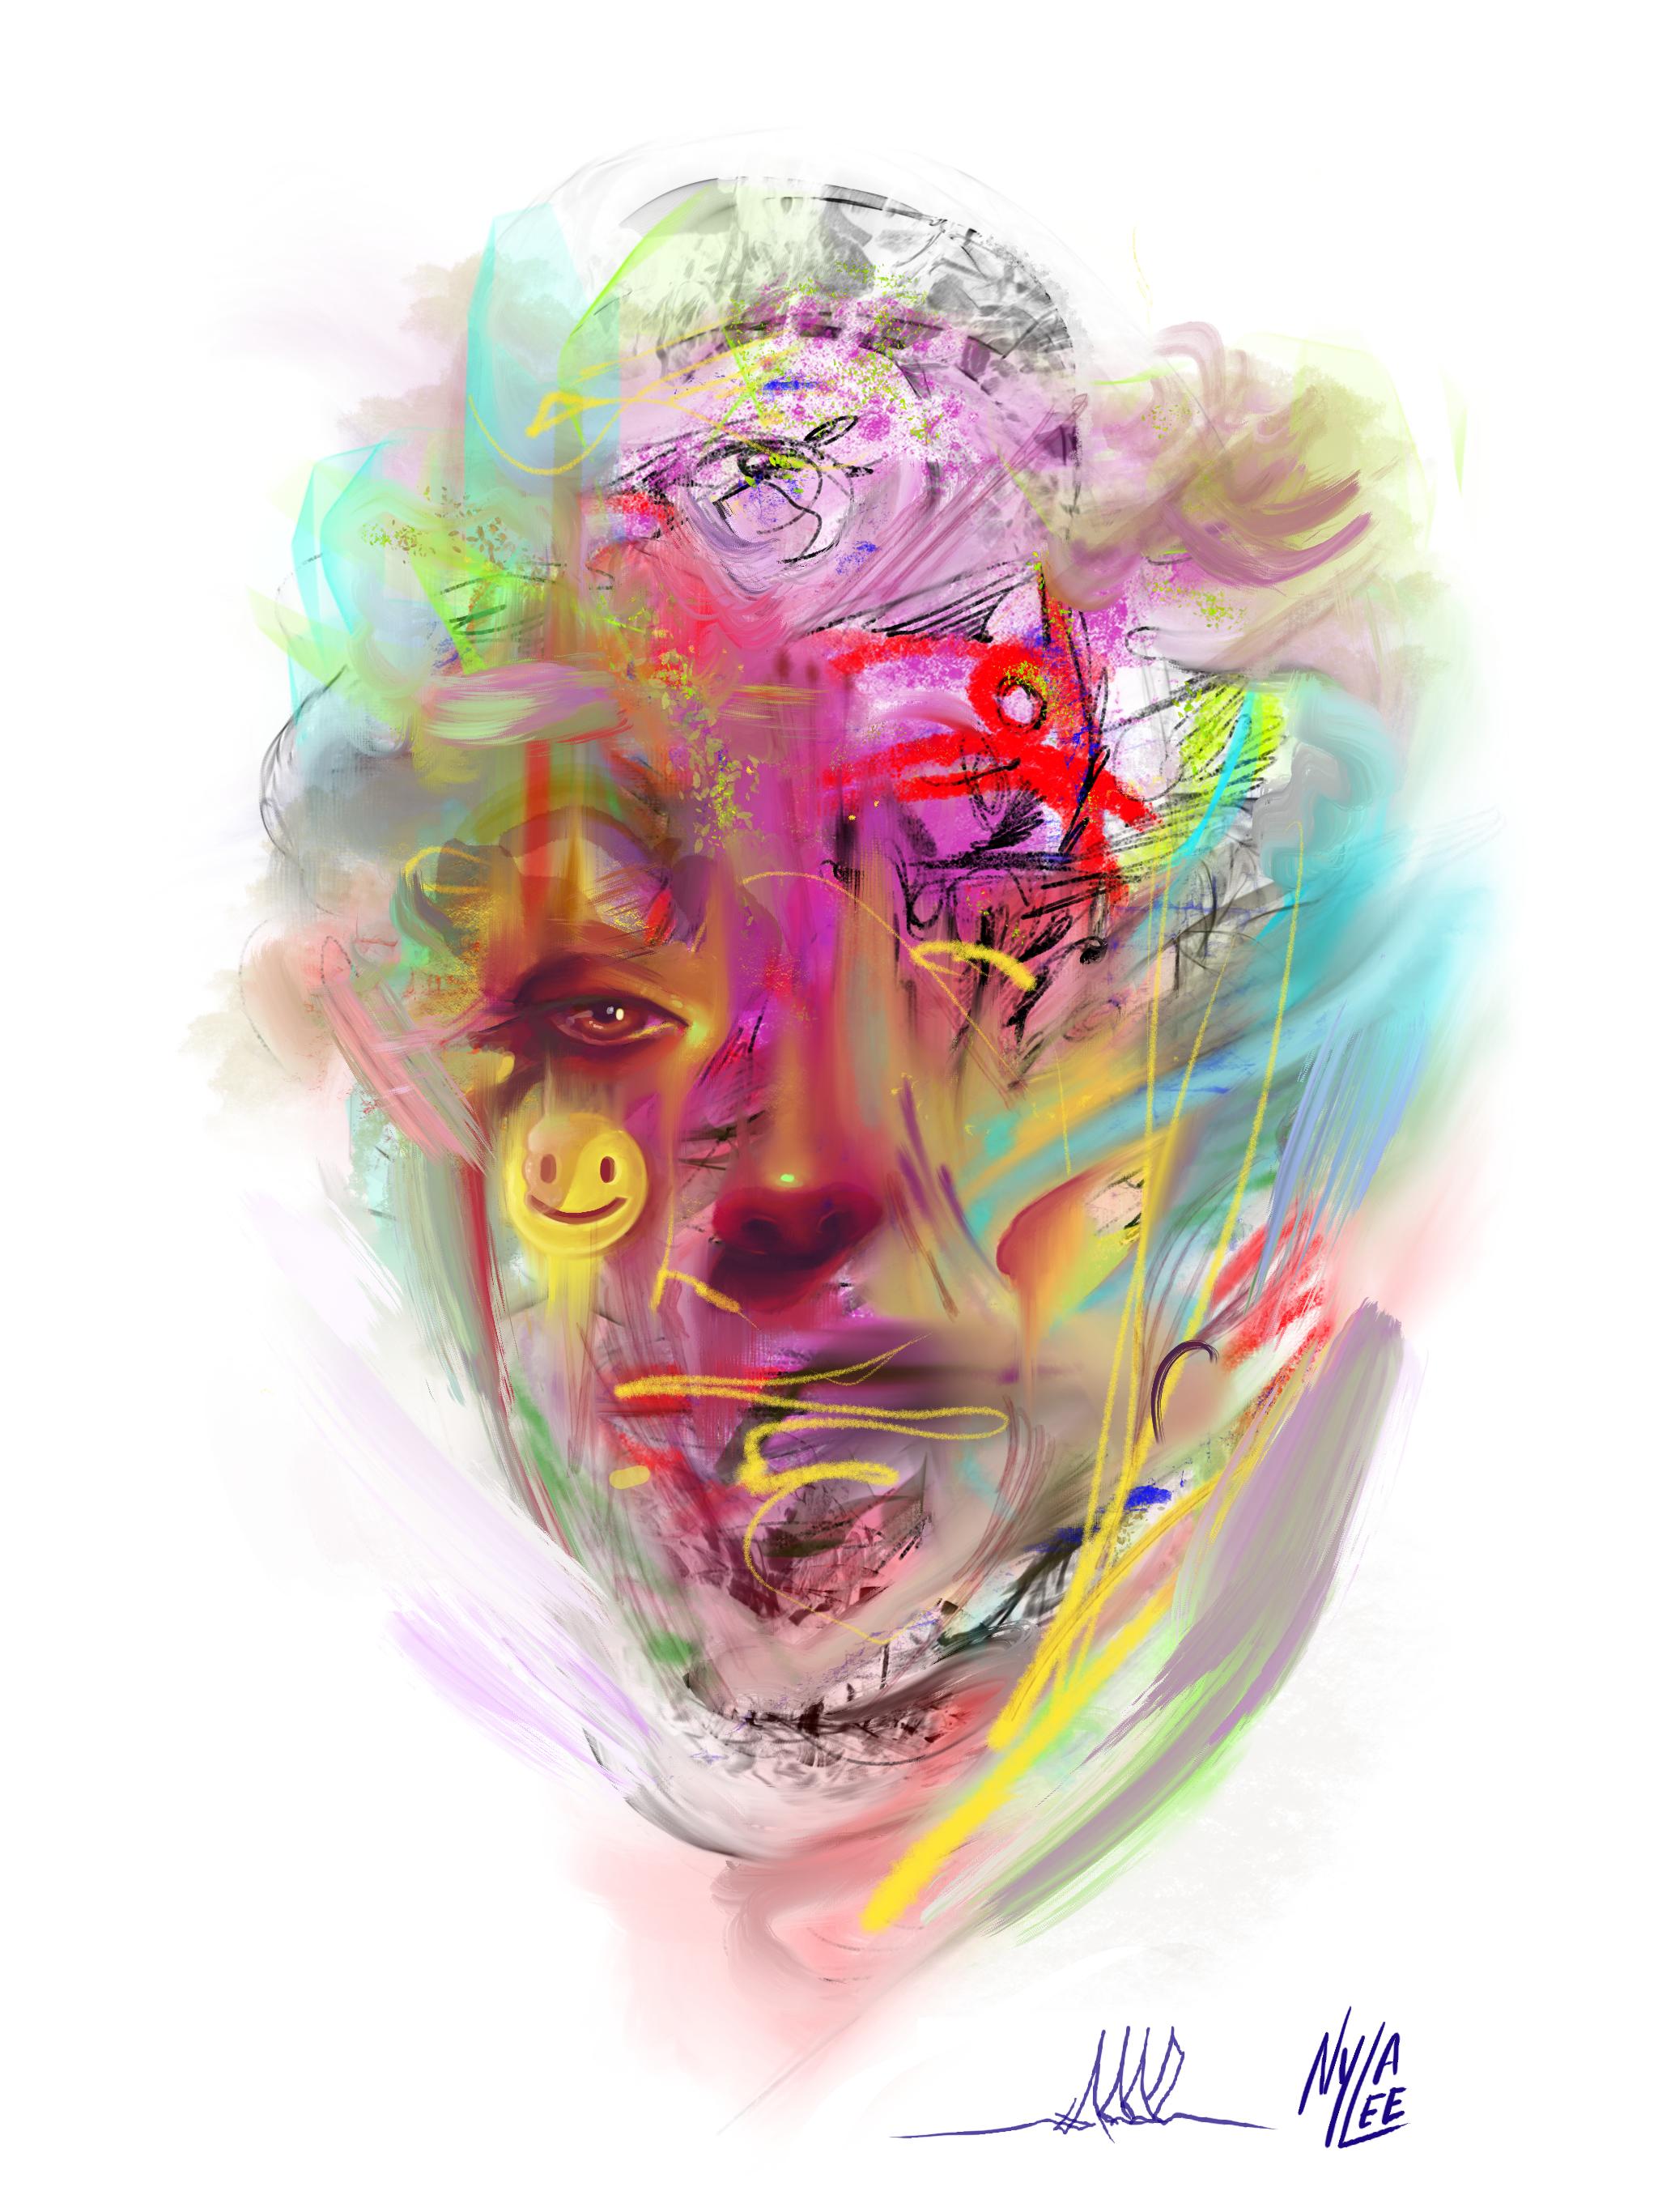 KOOZ X Nyla Lee in 2020 Pretty art, Pastel punk, Face art